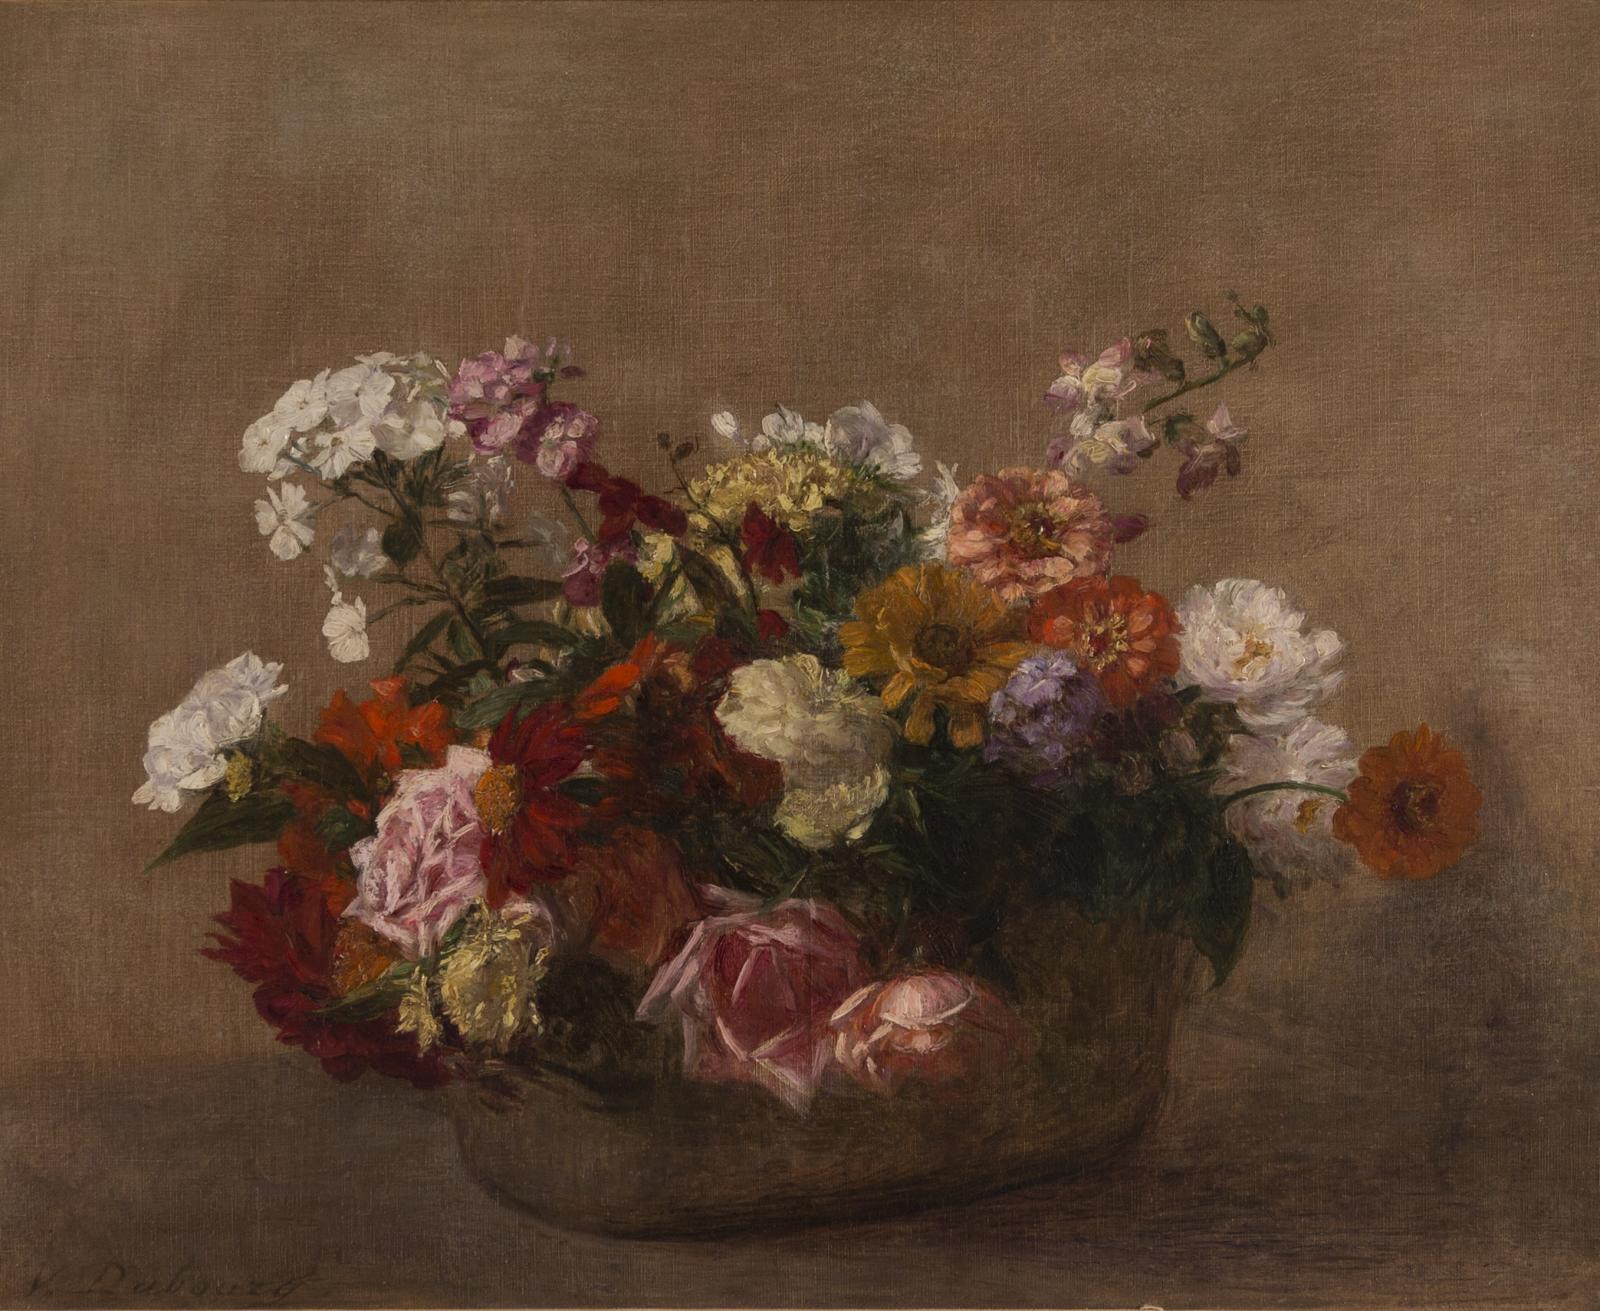 Victoria Dubourg Fantin-Latour, Nature Morte avec Fleurs, Circa 1900s